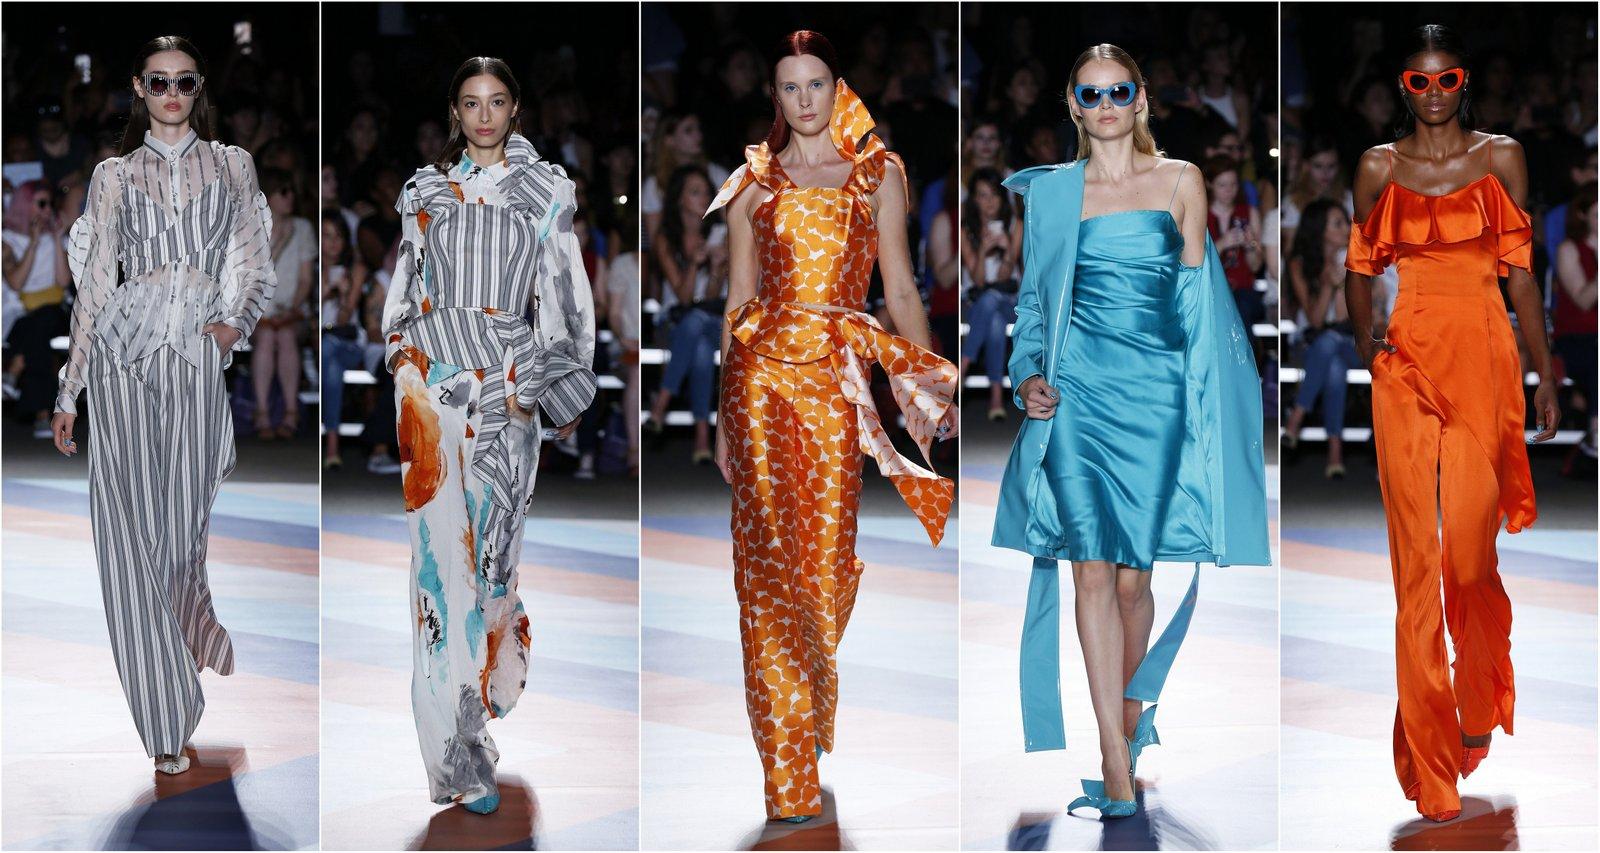 New York Fashion Week S/S 2017: Christian Siriano